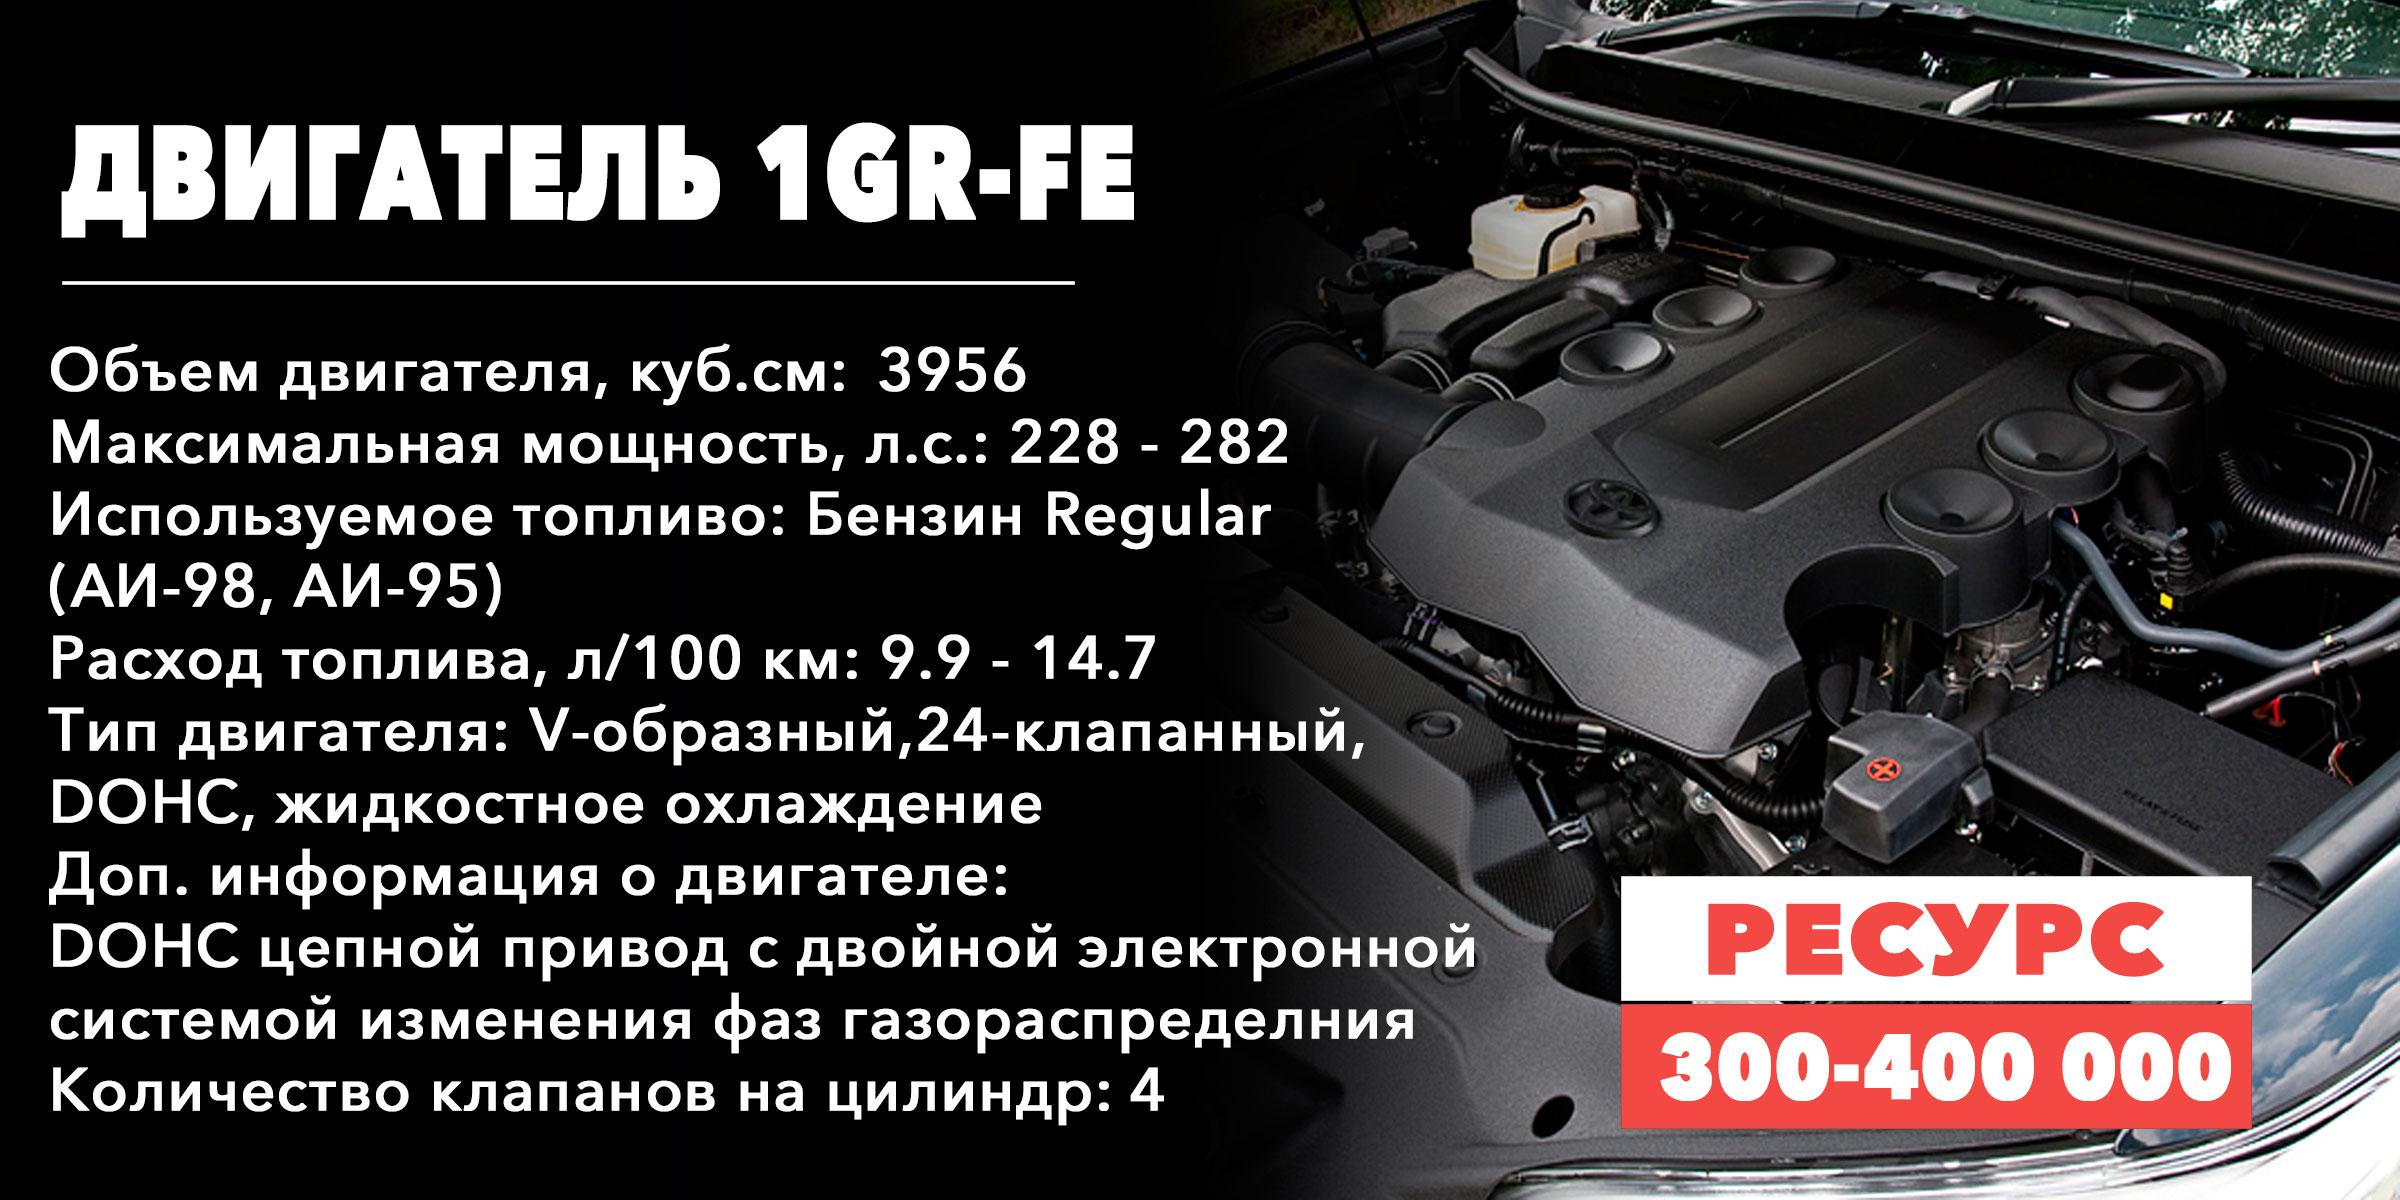 Ресурс установок семейства GR (1GR-FE)